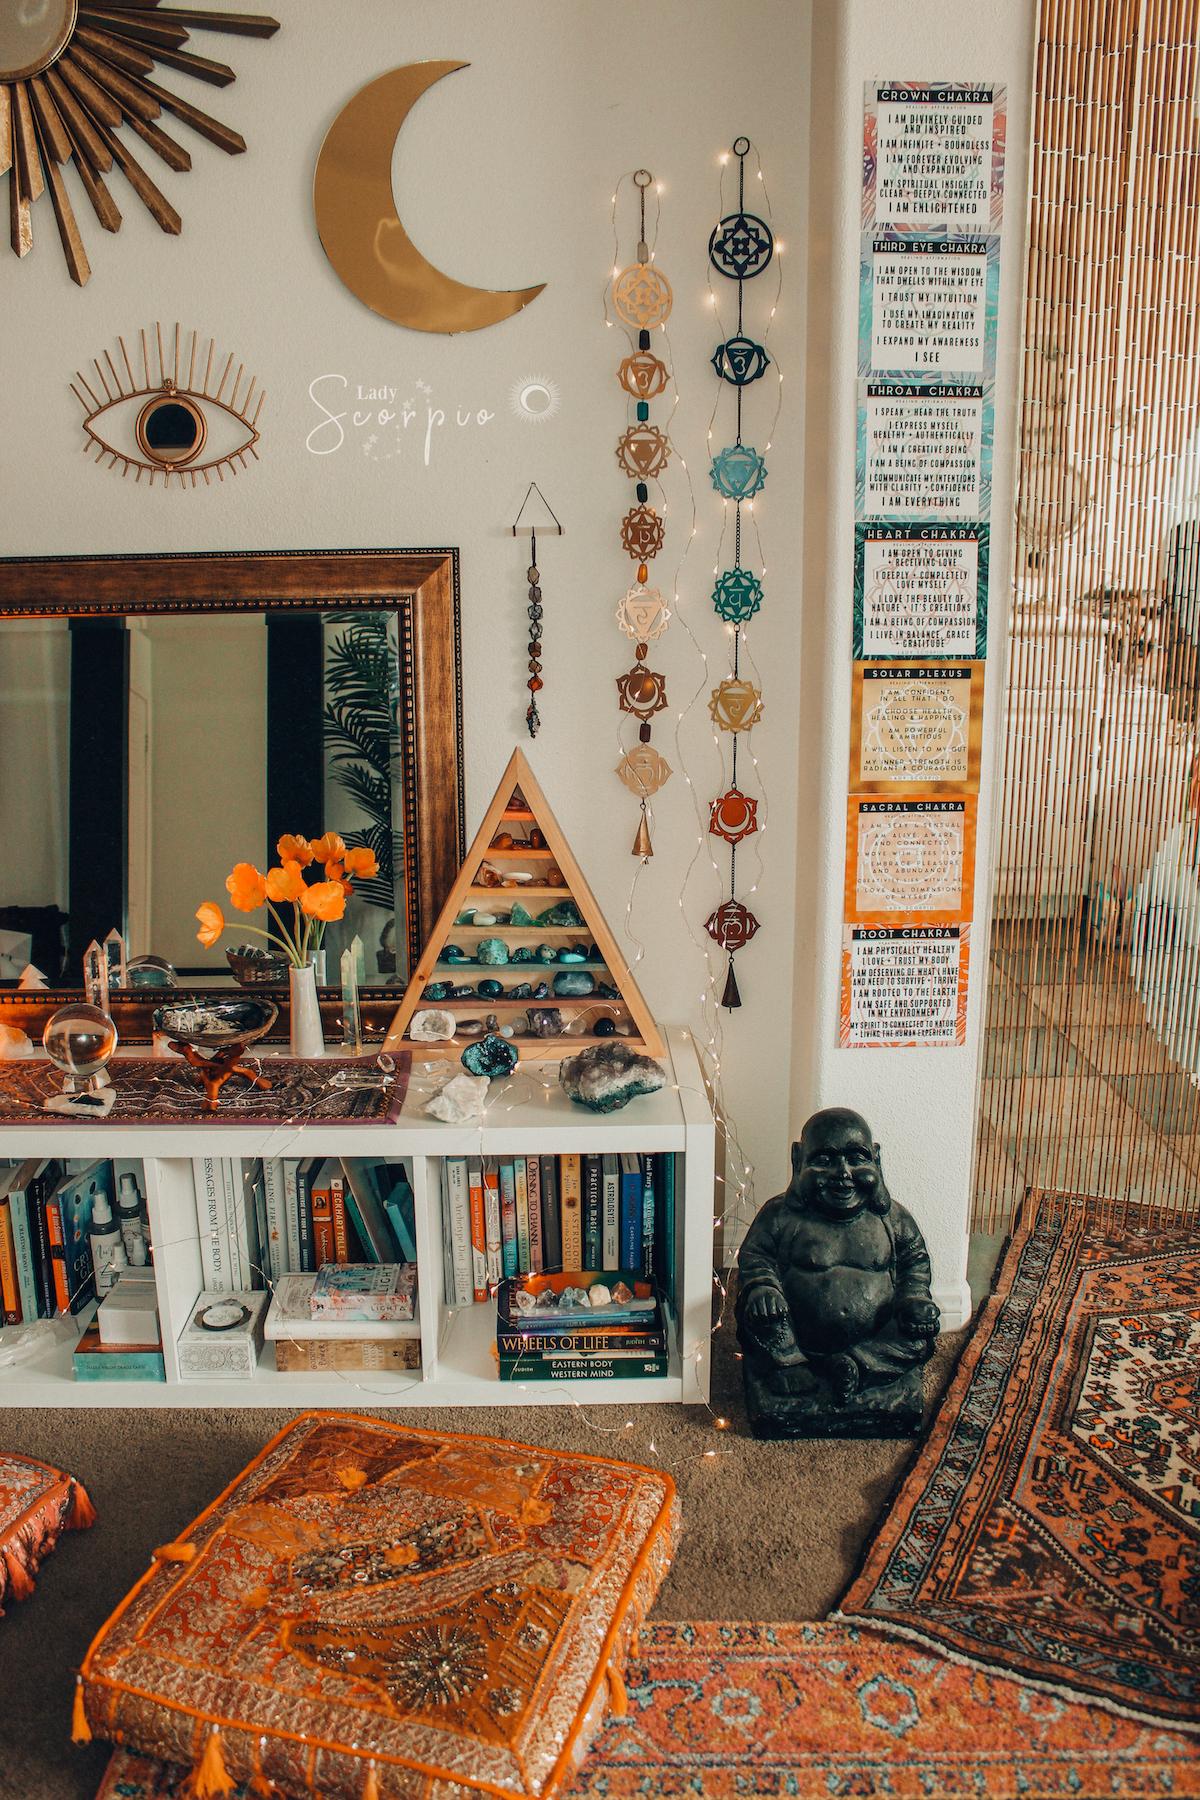 LADY SCORPIO in 2020 Boho room, Zen room, Aesthetic room